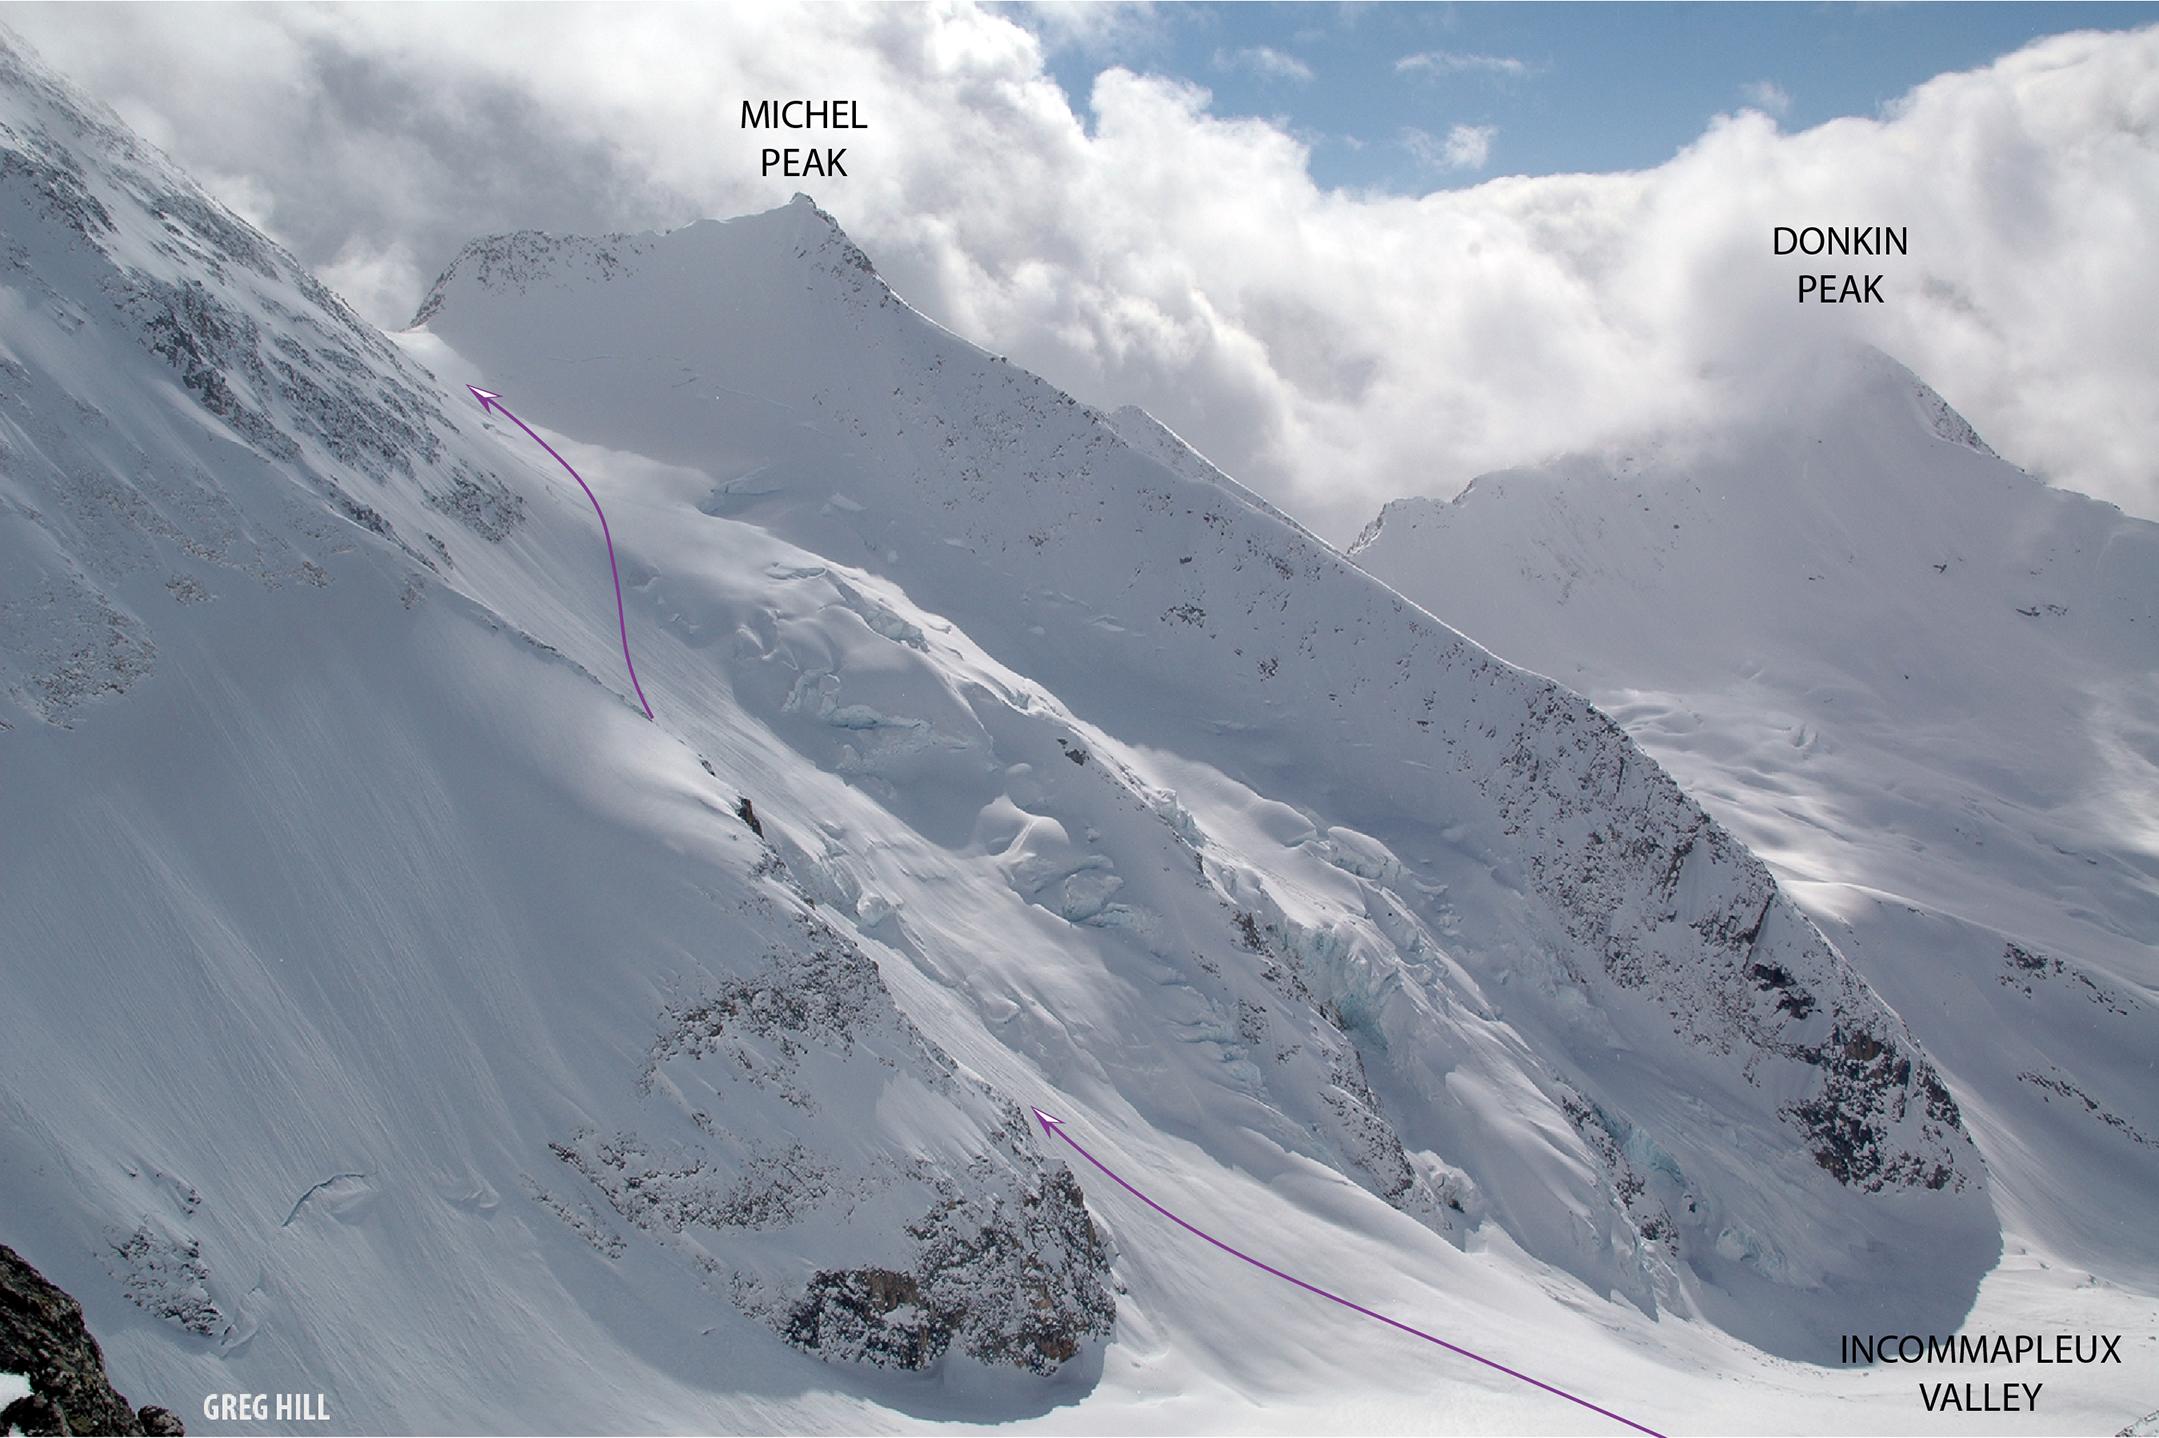 Feuz Peak Northwest Face with a deeper snowpack